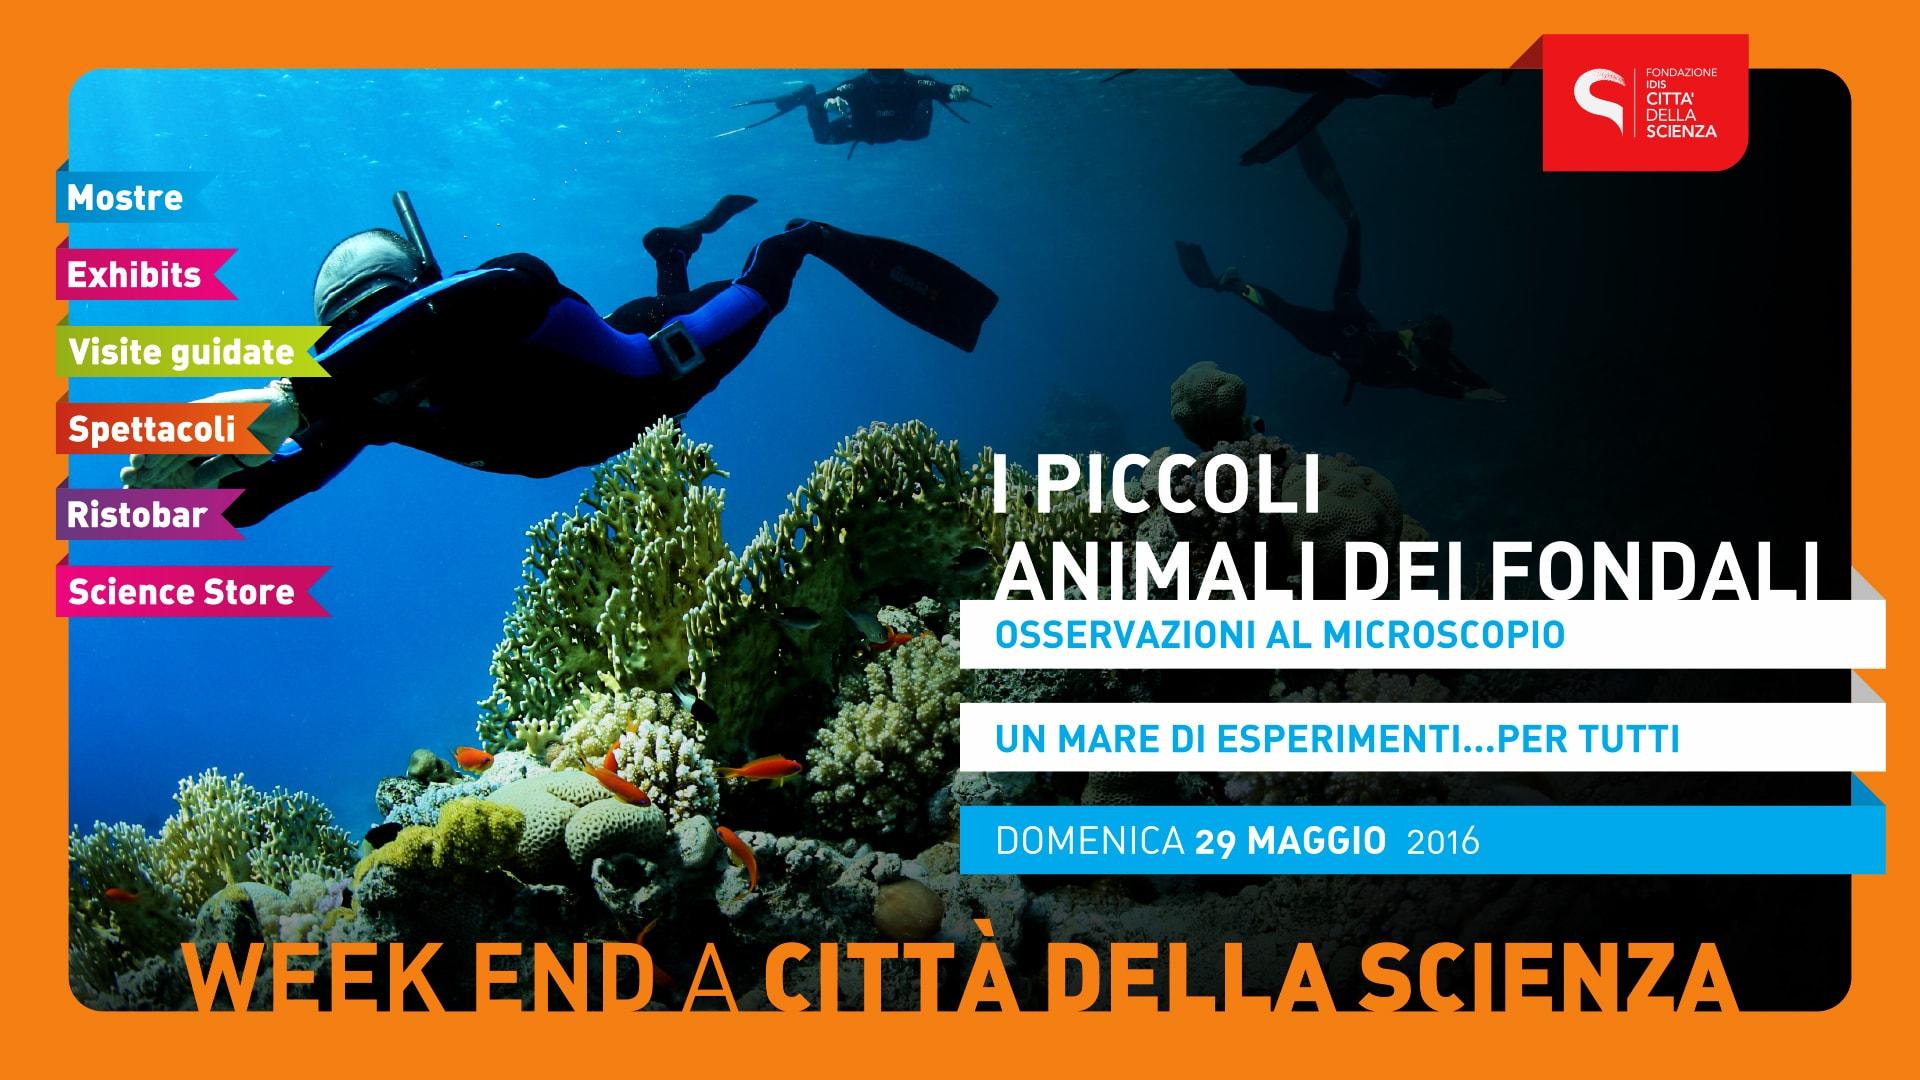 PICCOLI_ANIMALI_DEI_FONDALI_1920_x_1080_px-min